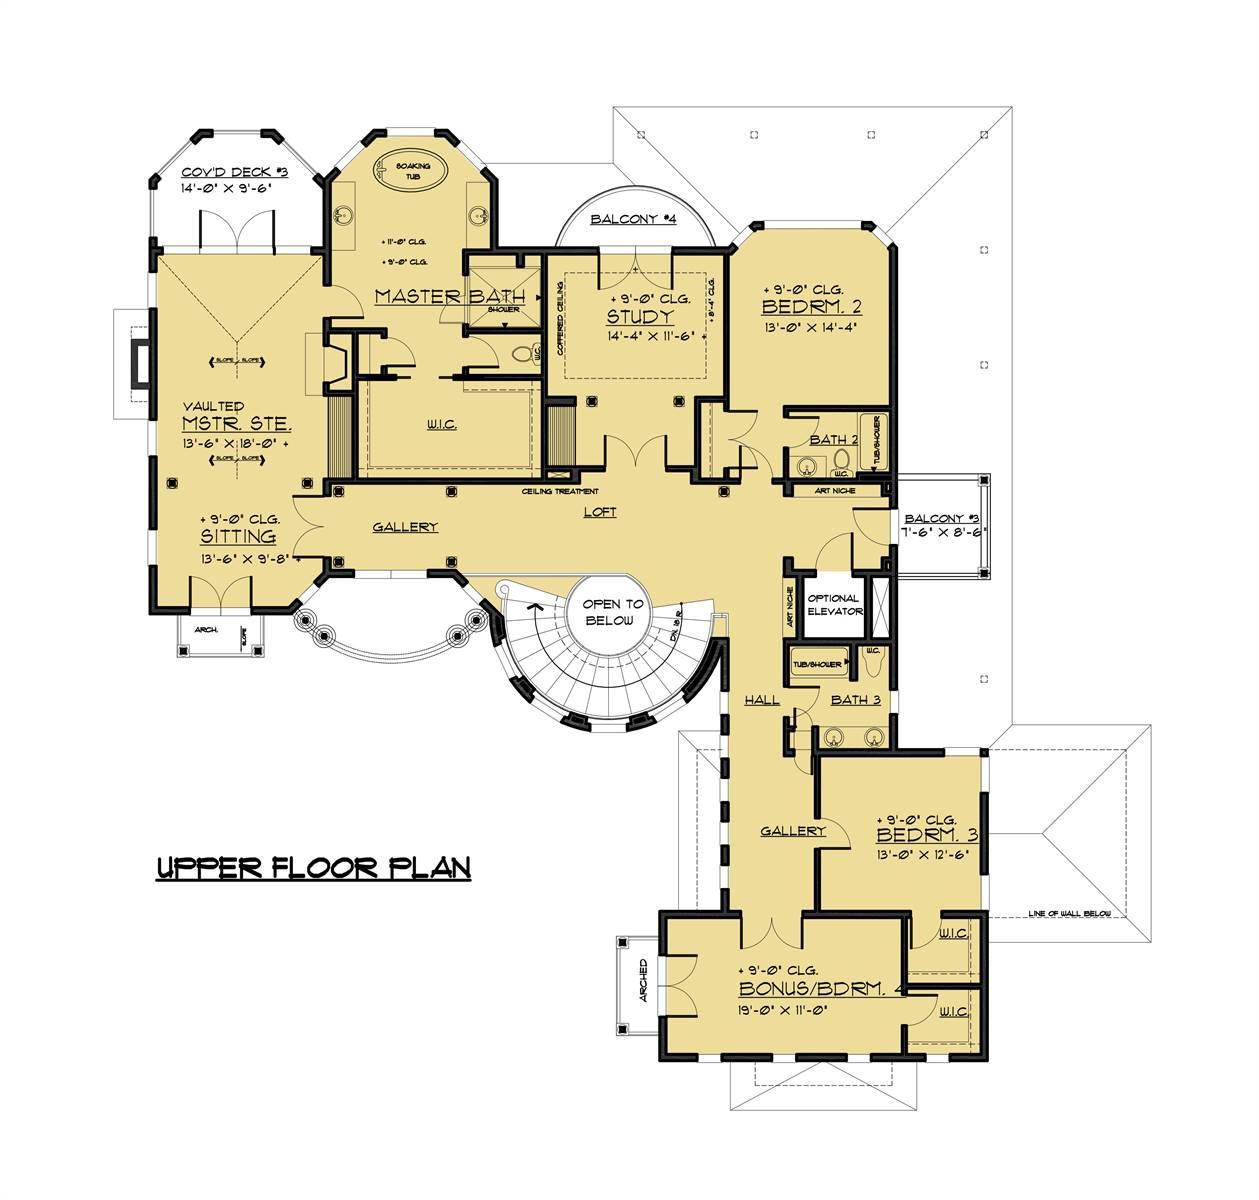 Luxury 3-Story Victorian Style House Plan 1458: Atherton